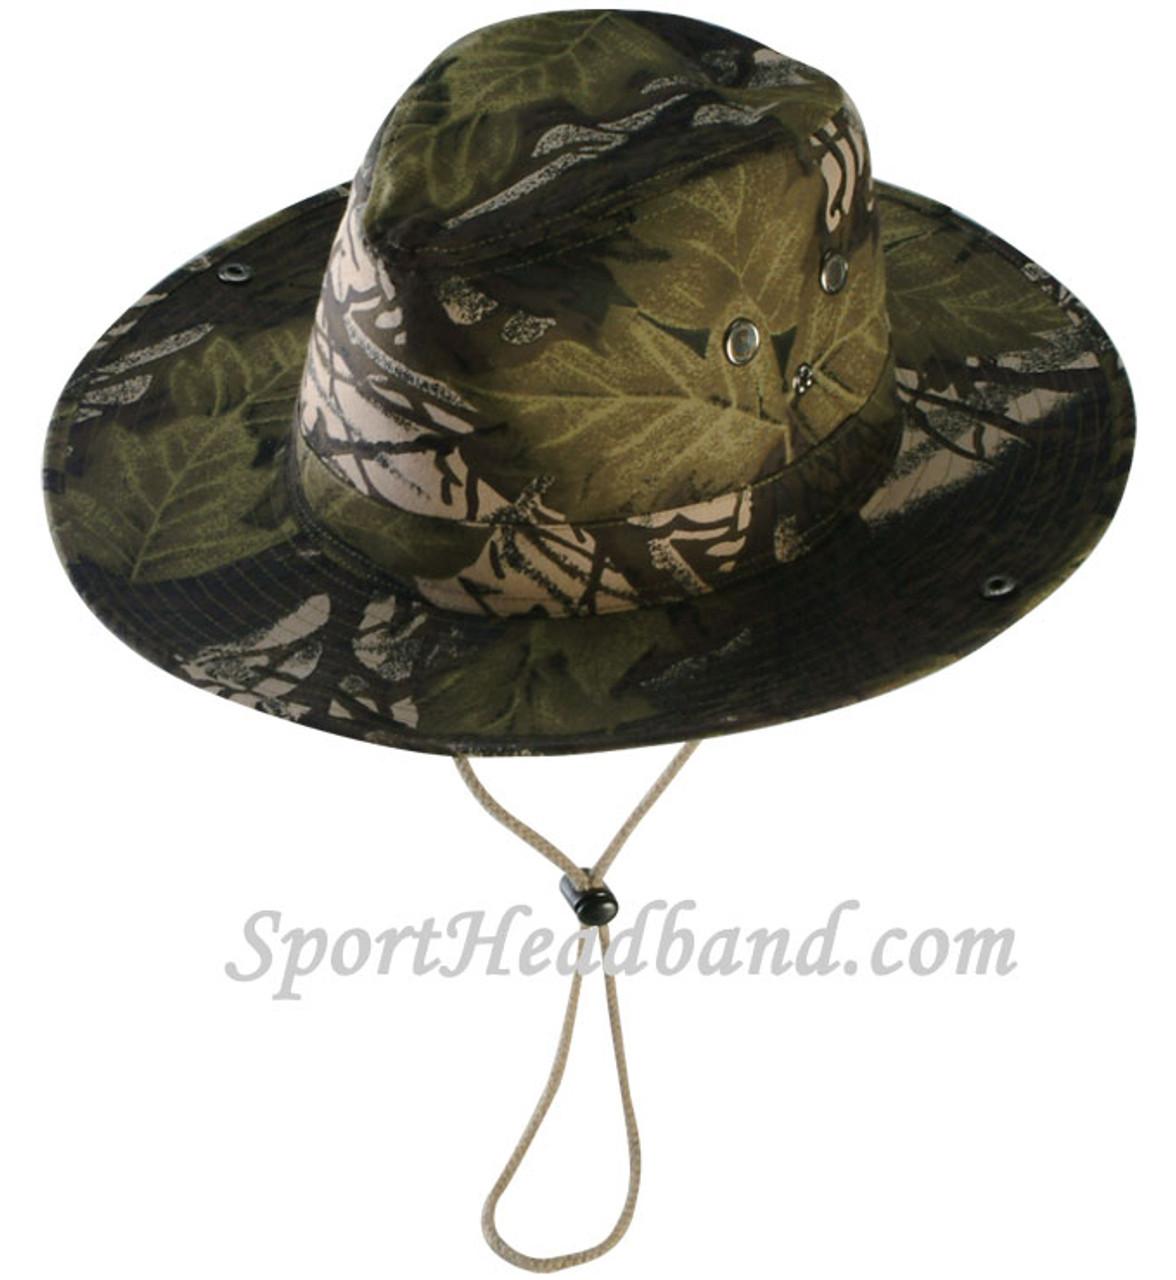 b96fc7cf4e2be Mossgreen Hunting Camouflage Bucket Hat Safari Style - SportHeadband.com